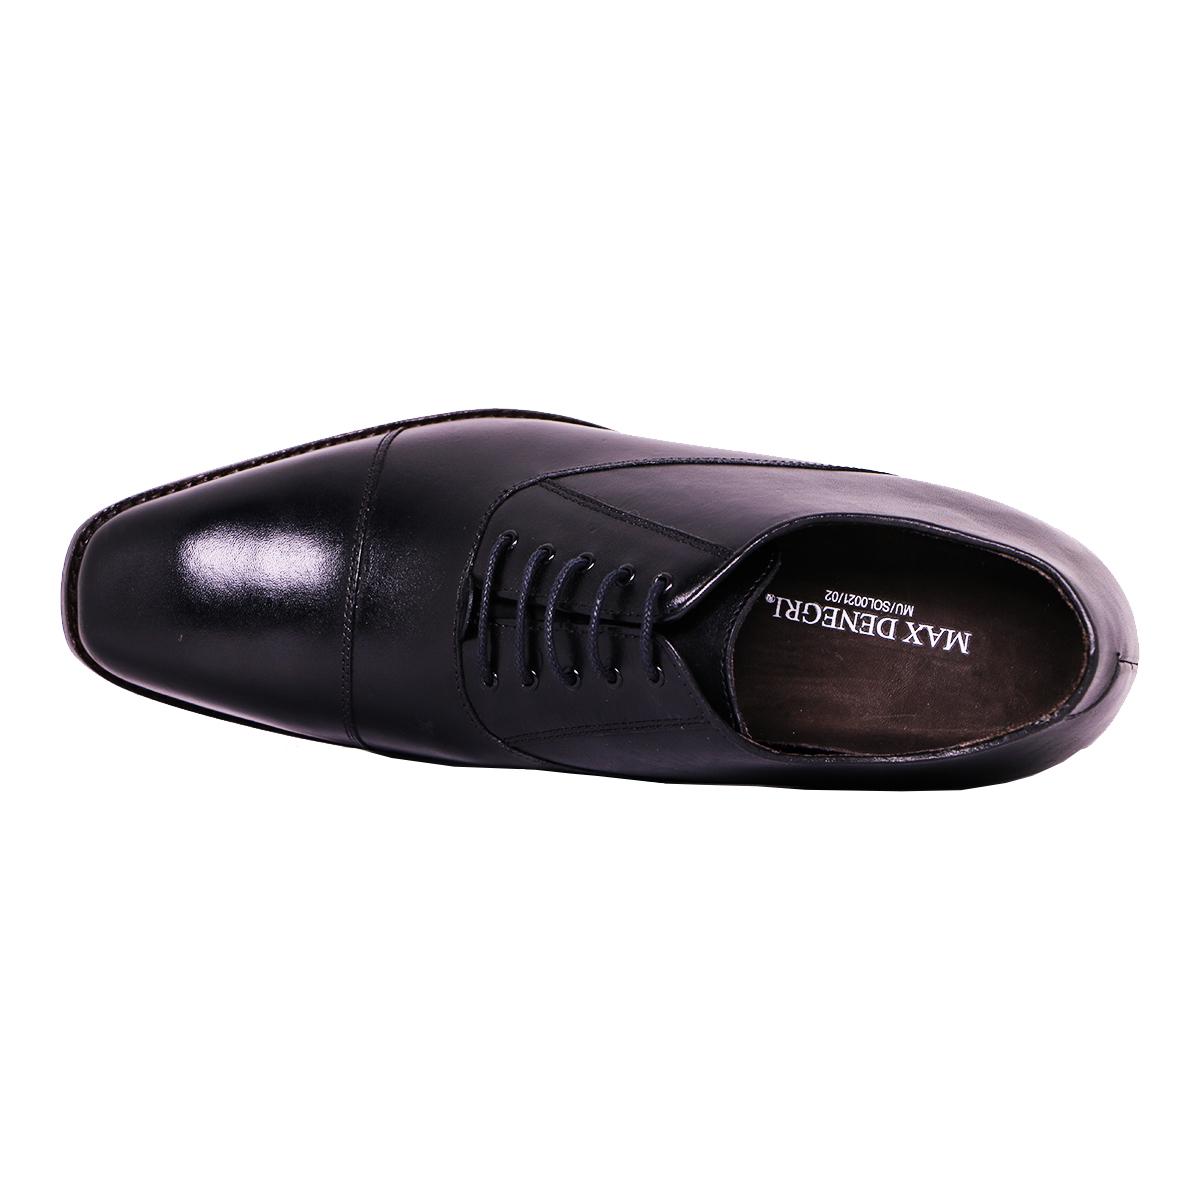 Zapato Formal Director Negro Max Denegri +7cms De Altura_72810